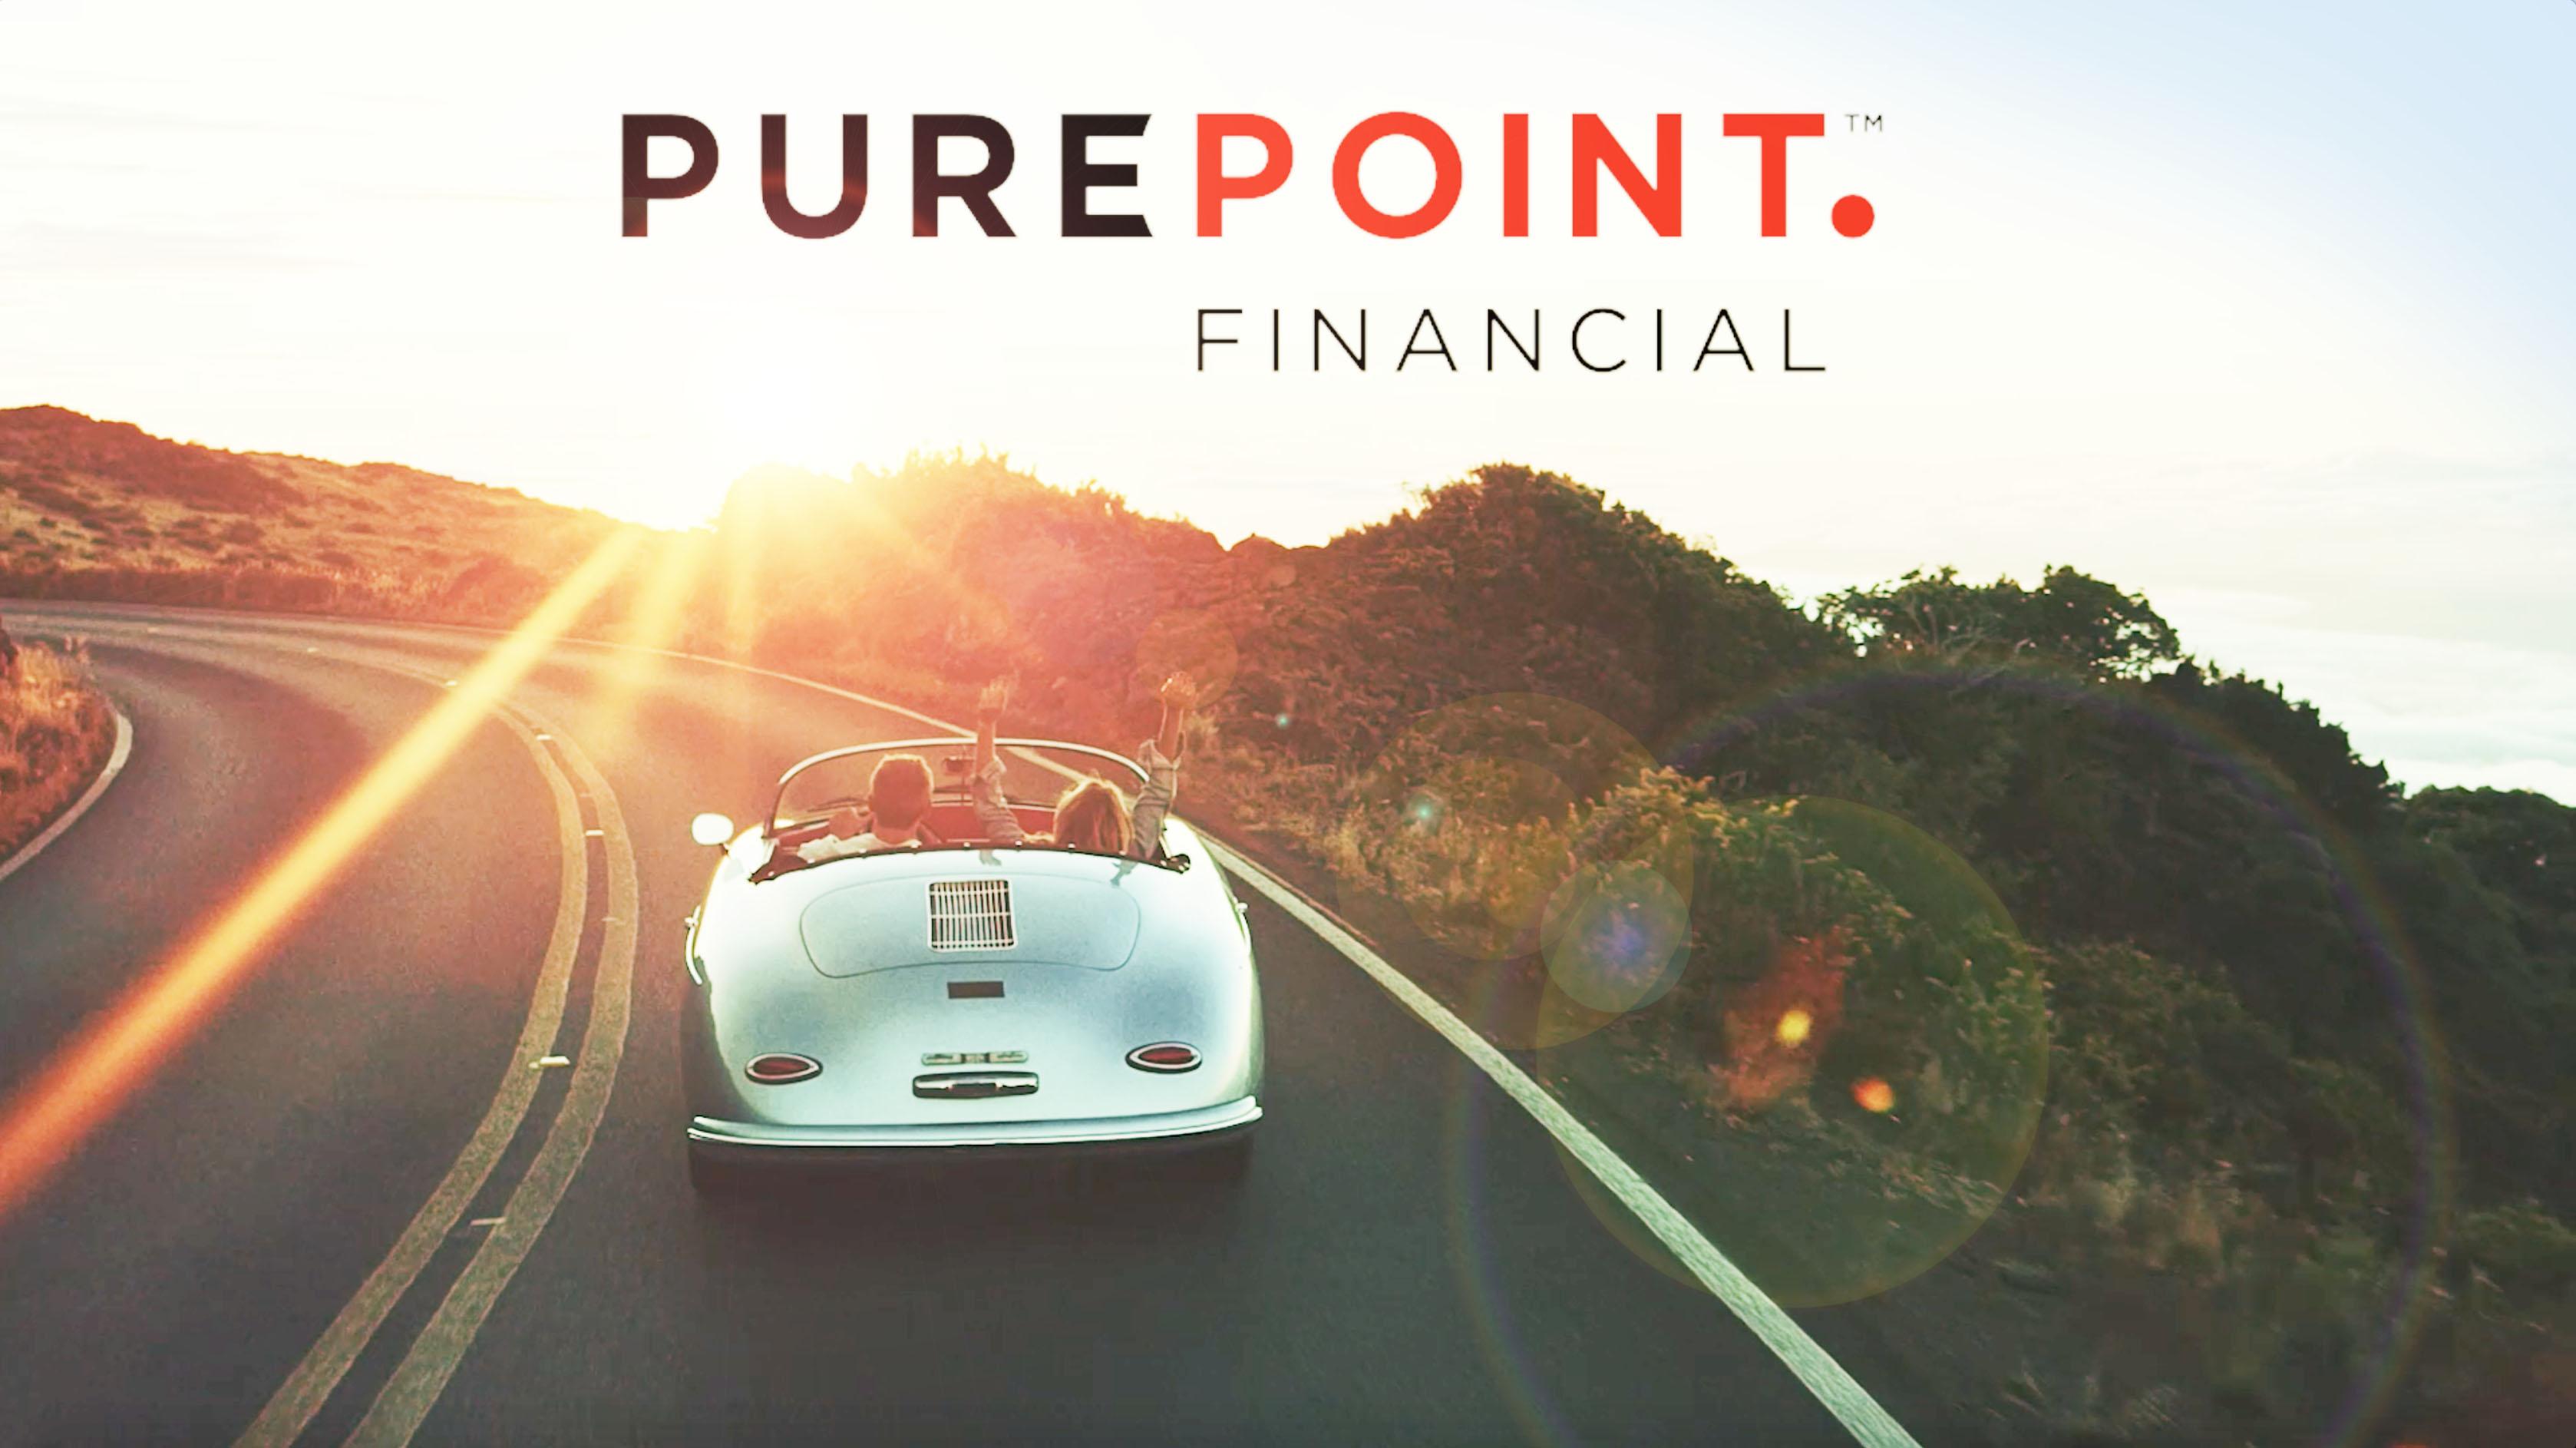 purepoint